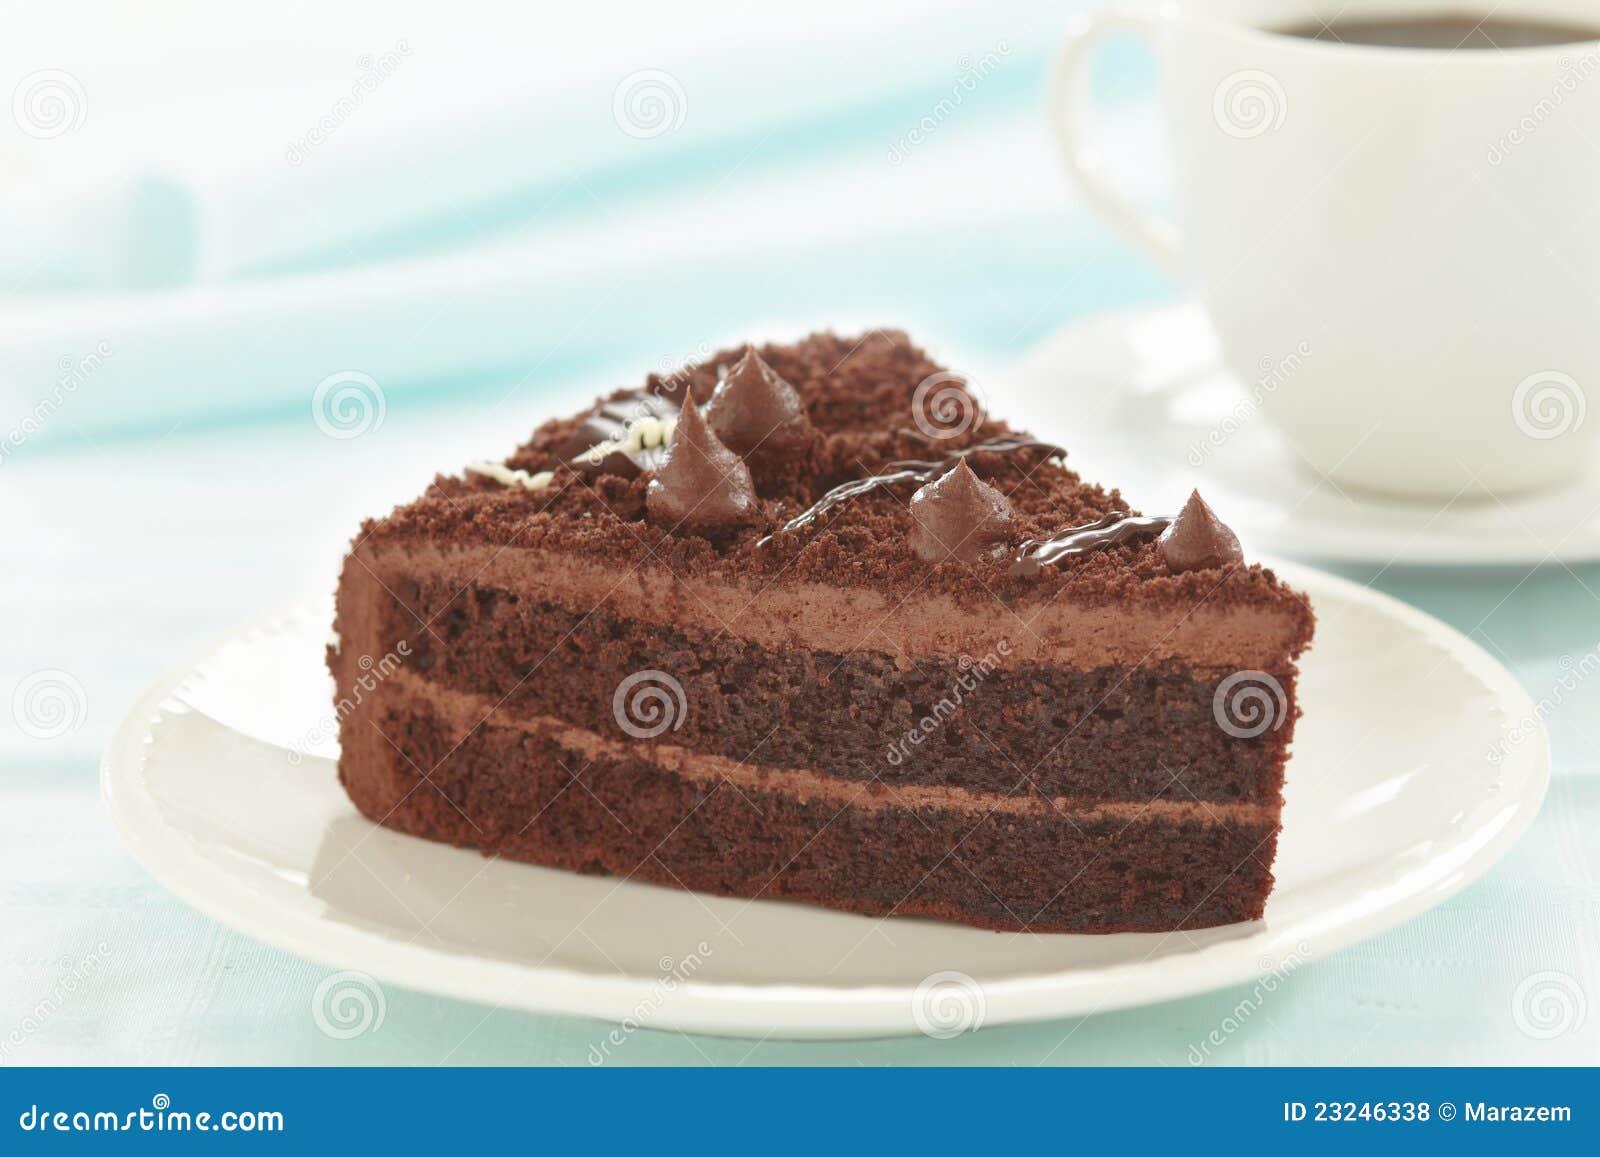 Chocolate Sheet Cake Buy